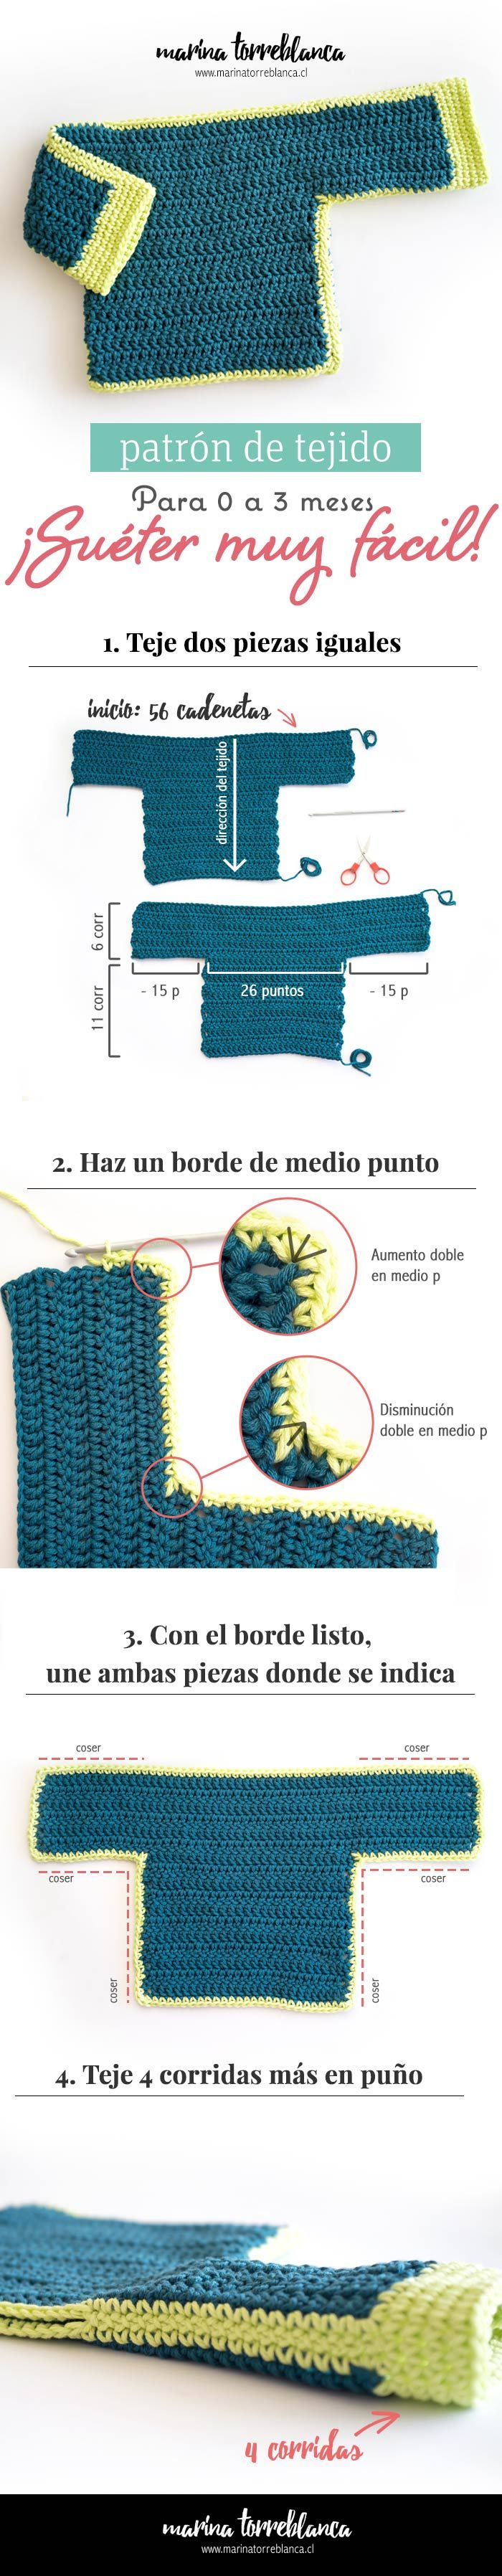 666 best Cosas de Baby images on Pinterest | Crochet patterns, Baby ...